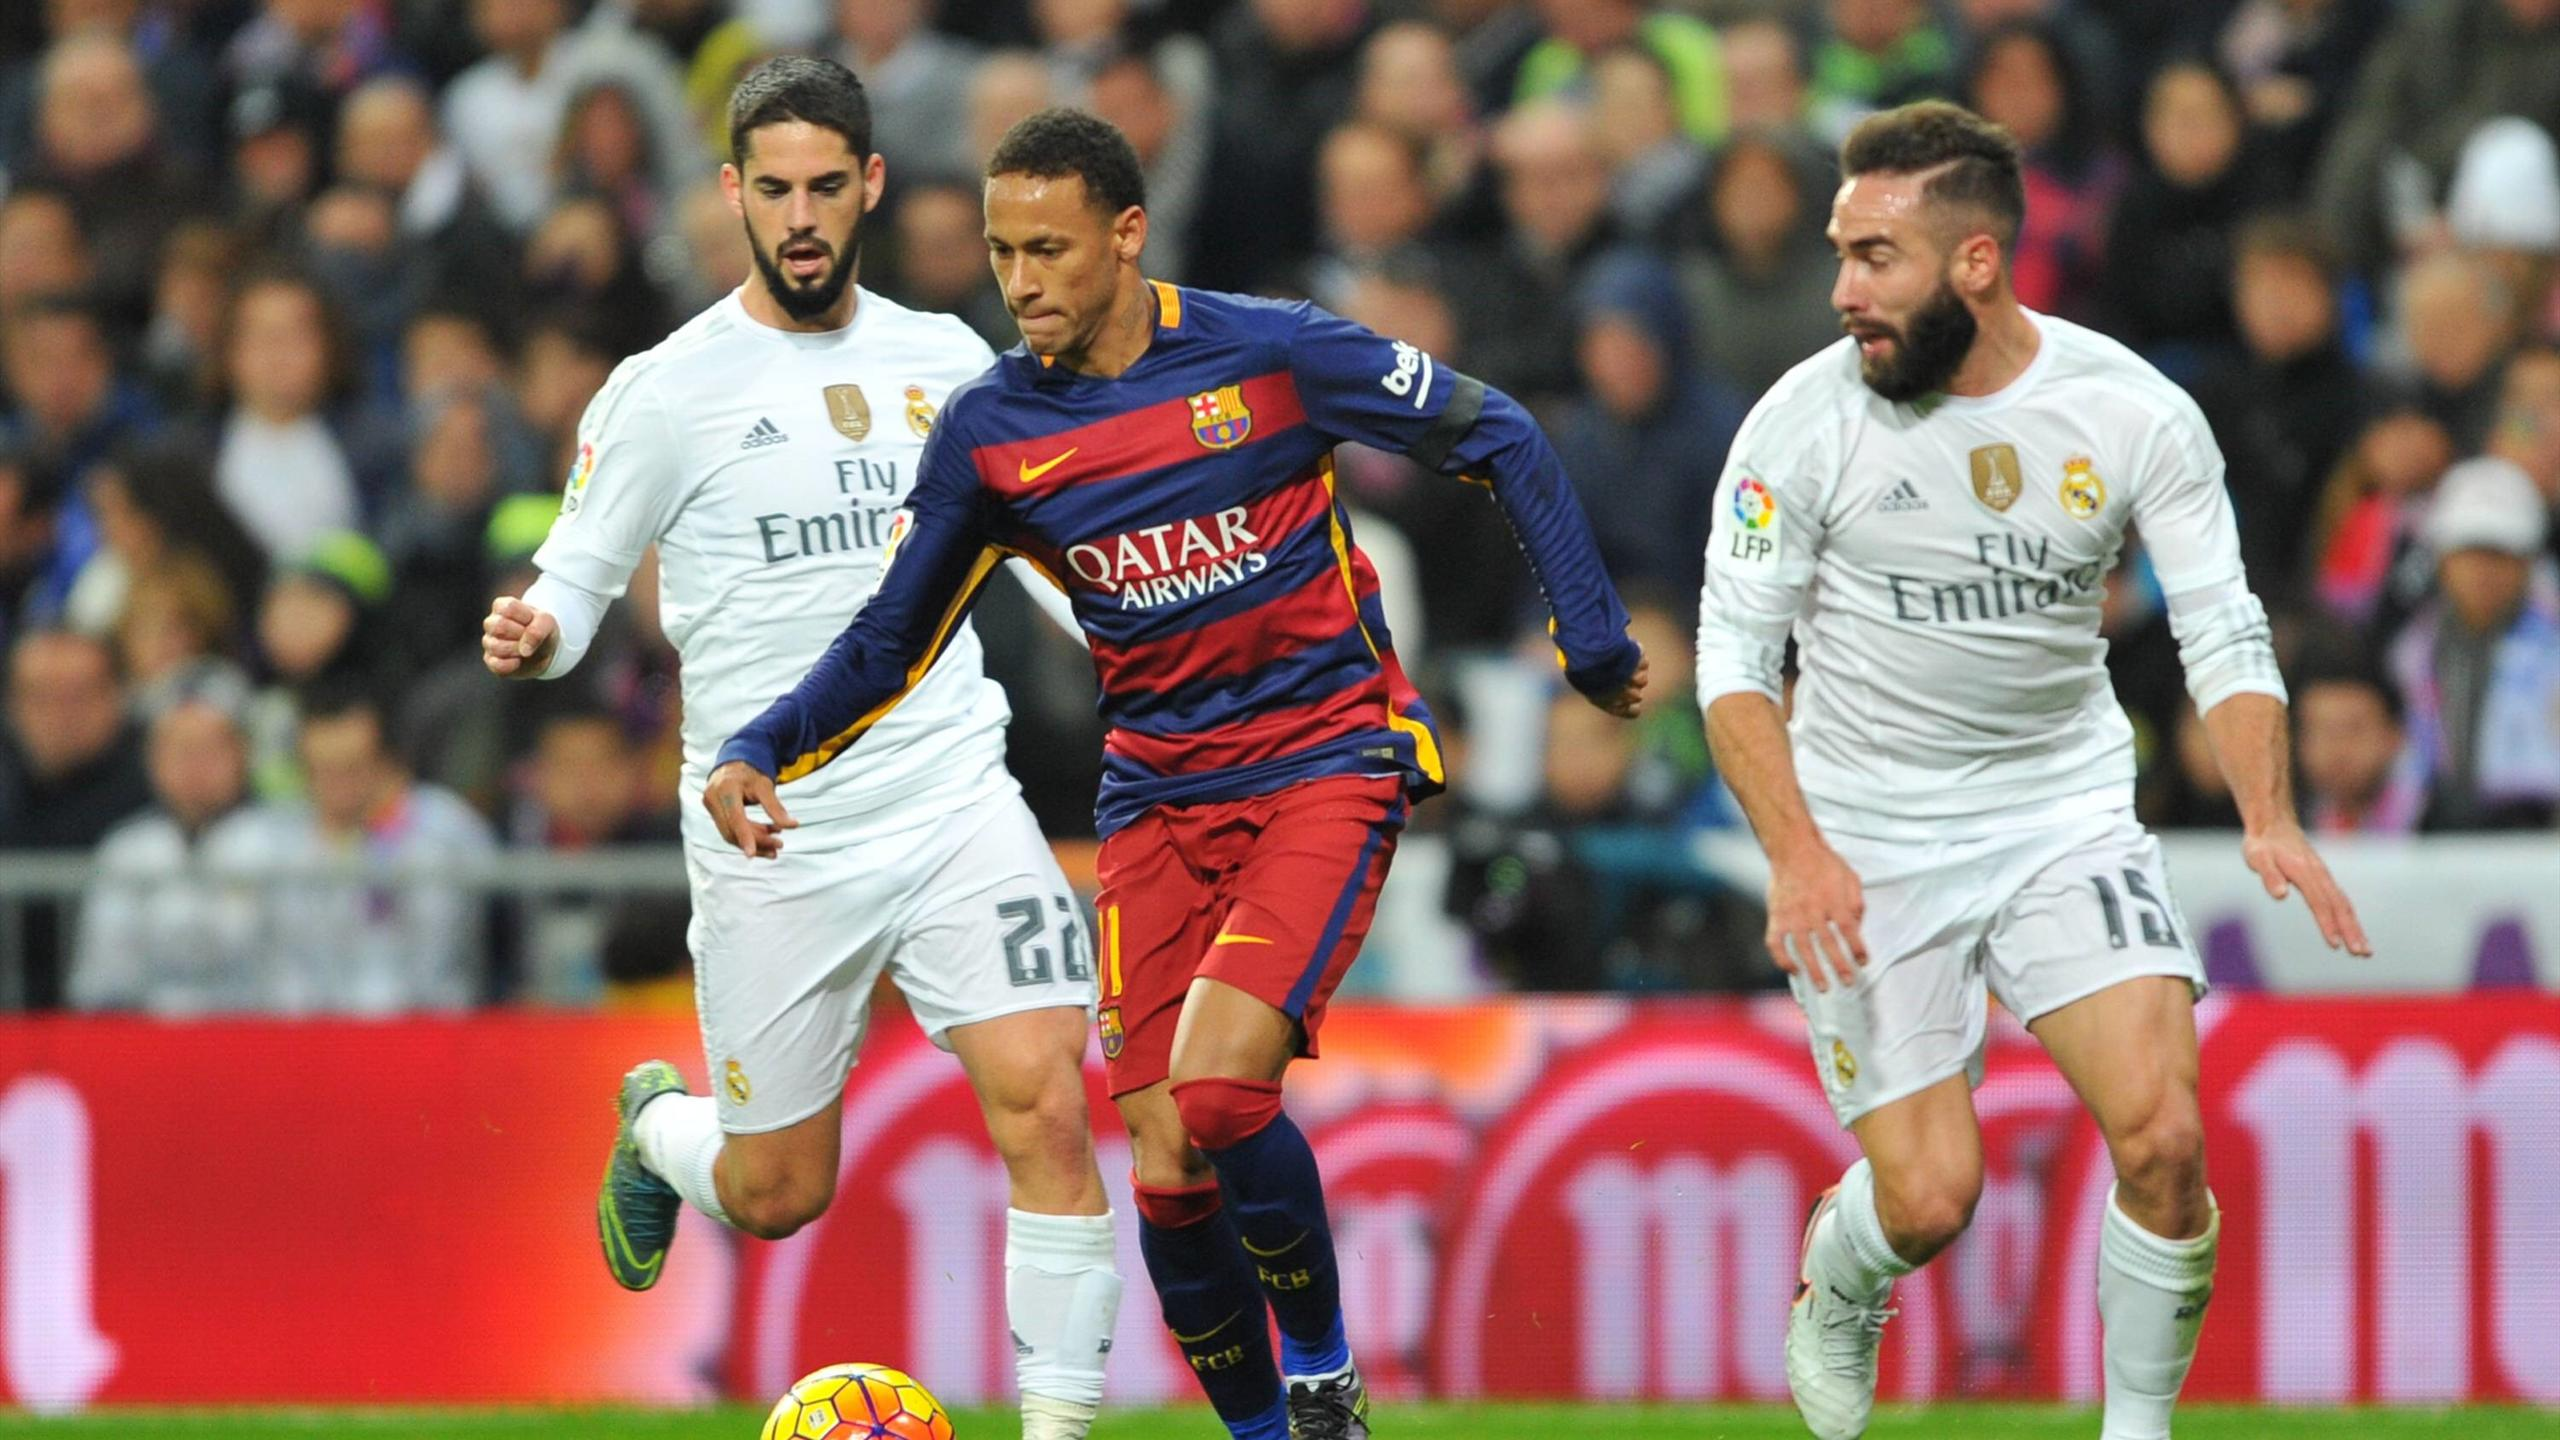 Neymar during El Clasico Barcelona vs Real Madrid